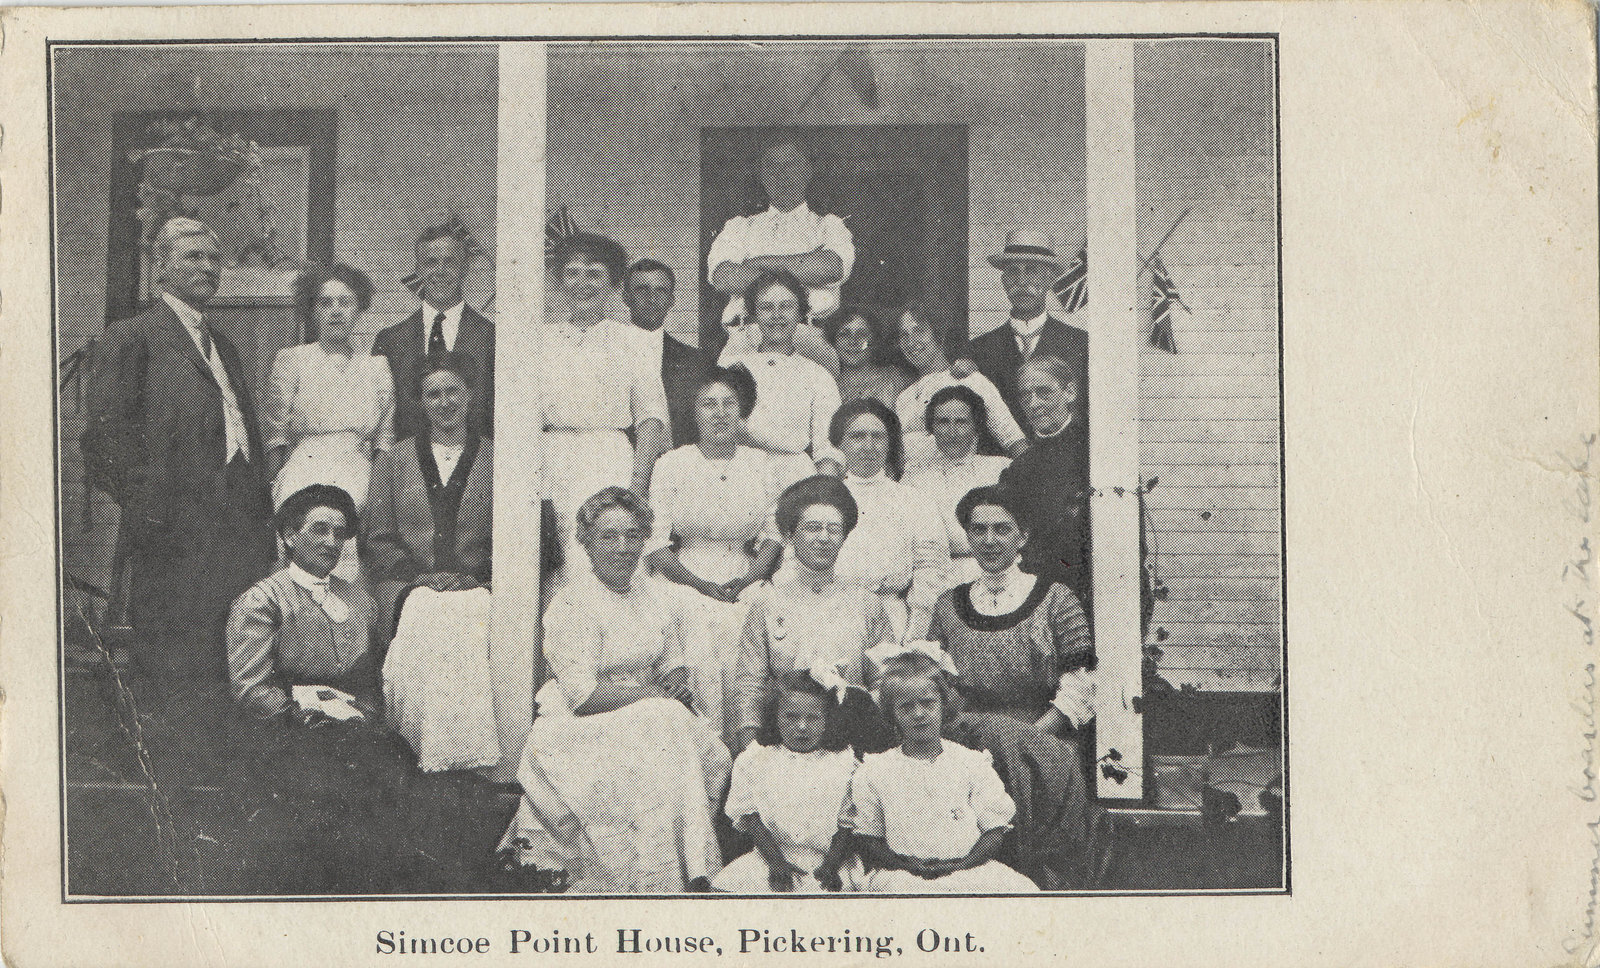 Simcoe Point House